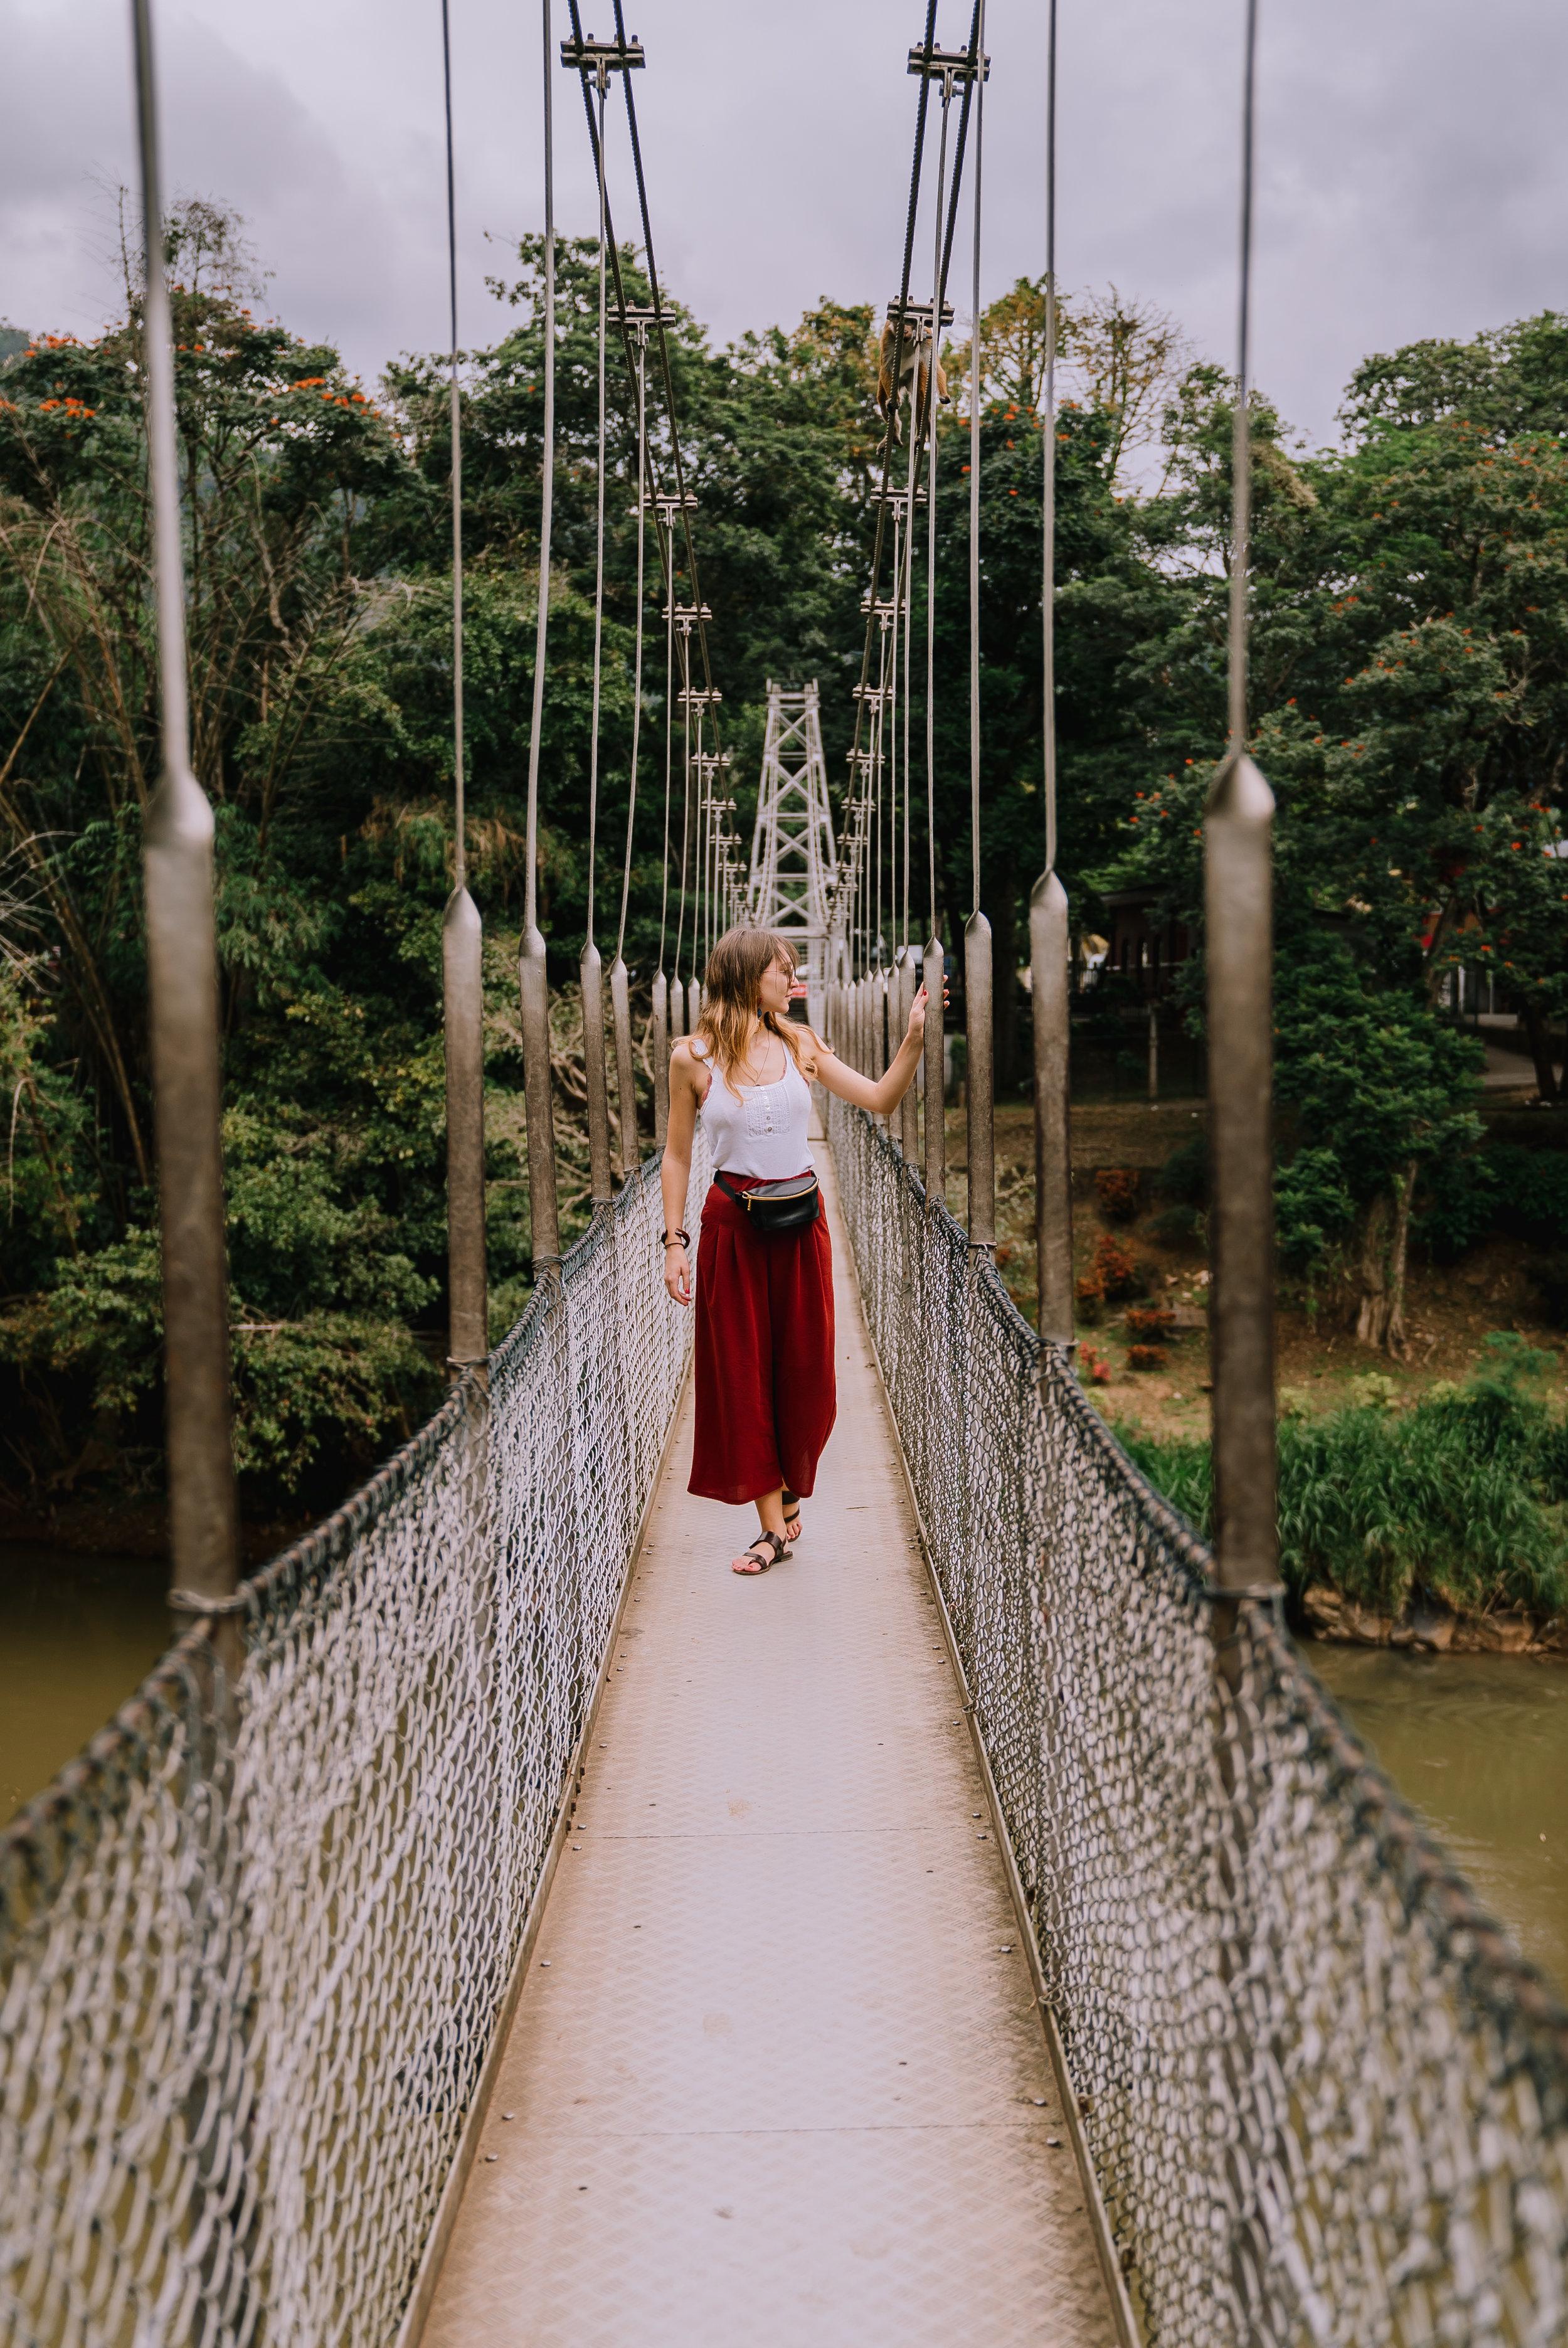 Royal Garden - Ponte Sospeso